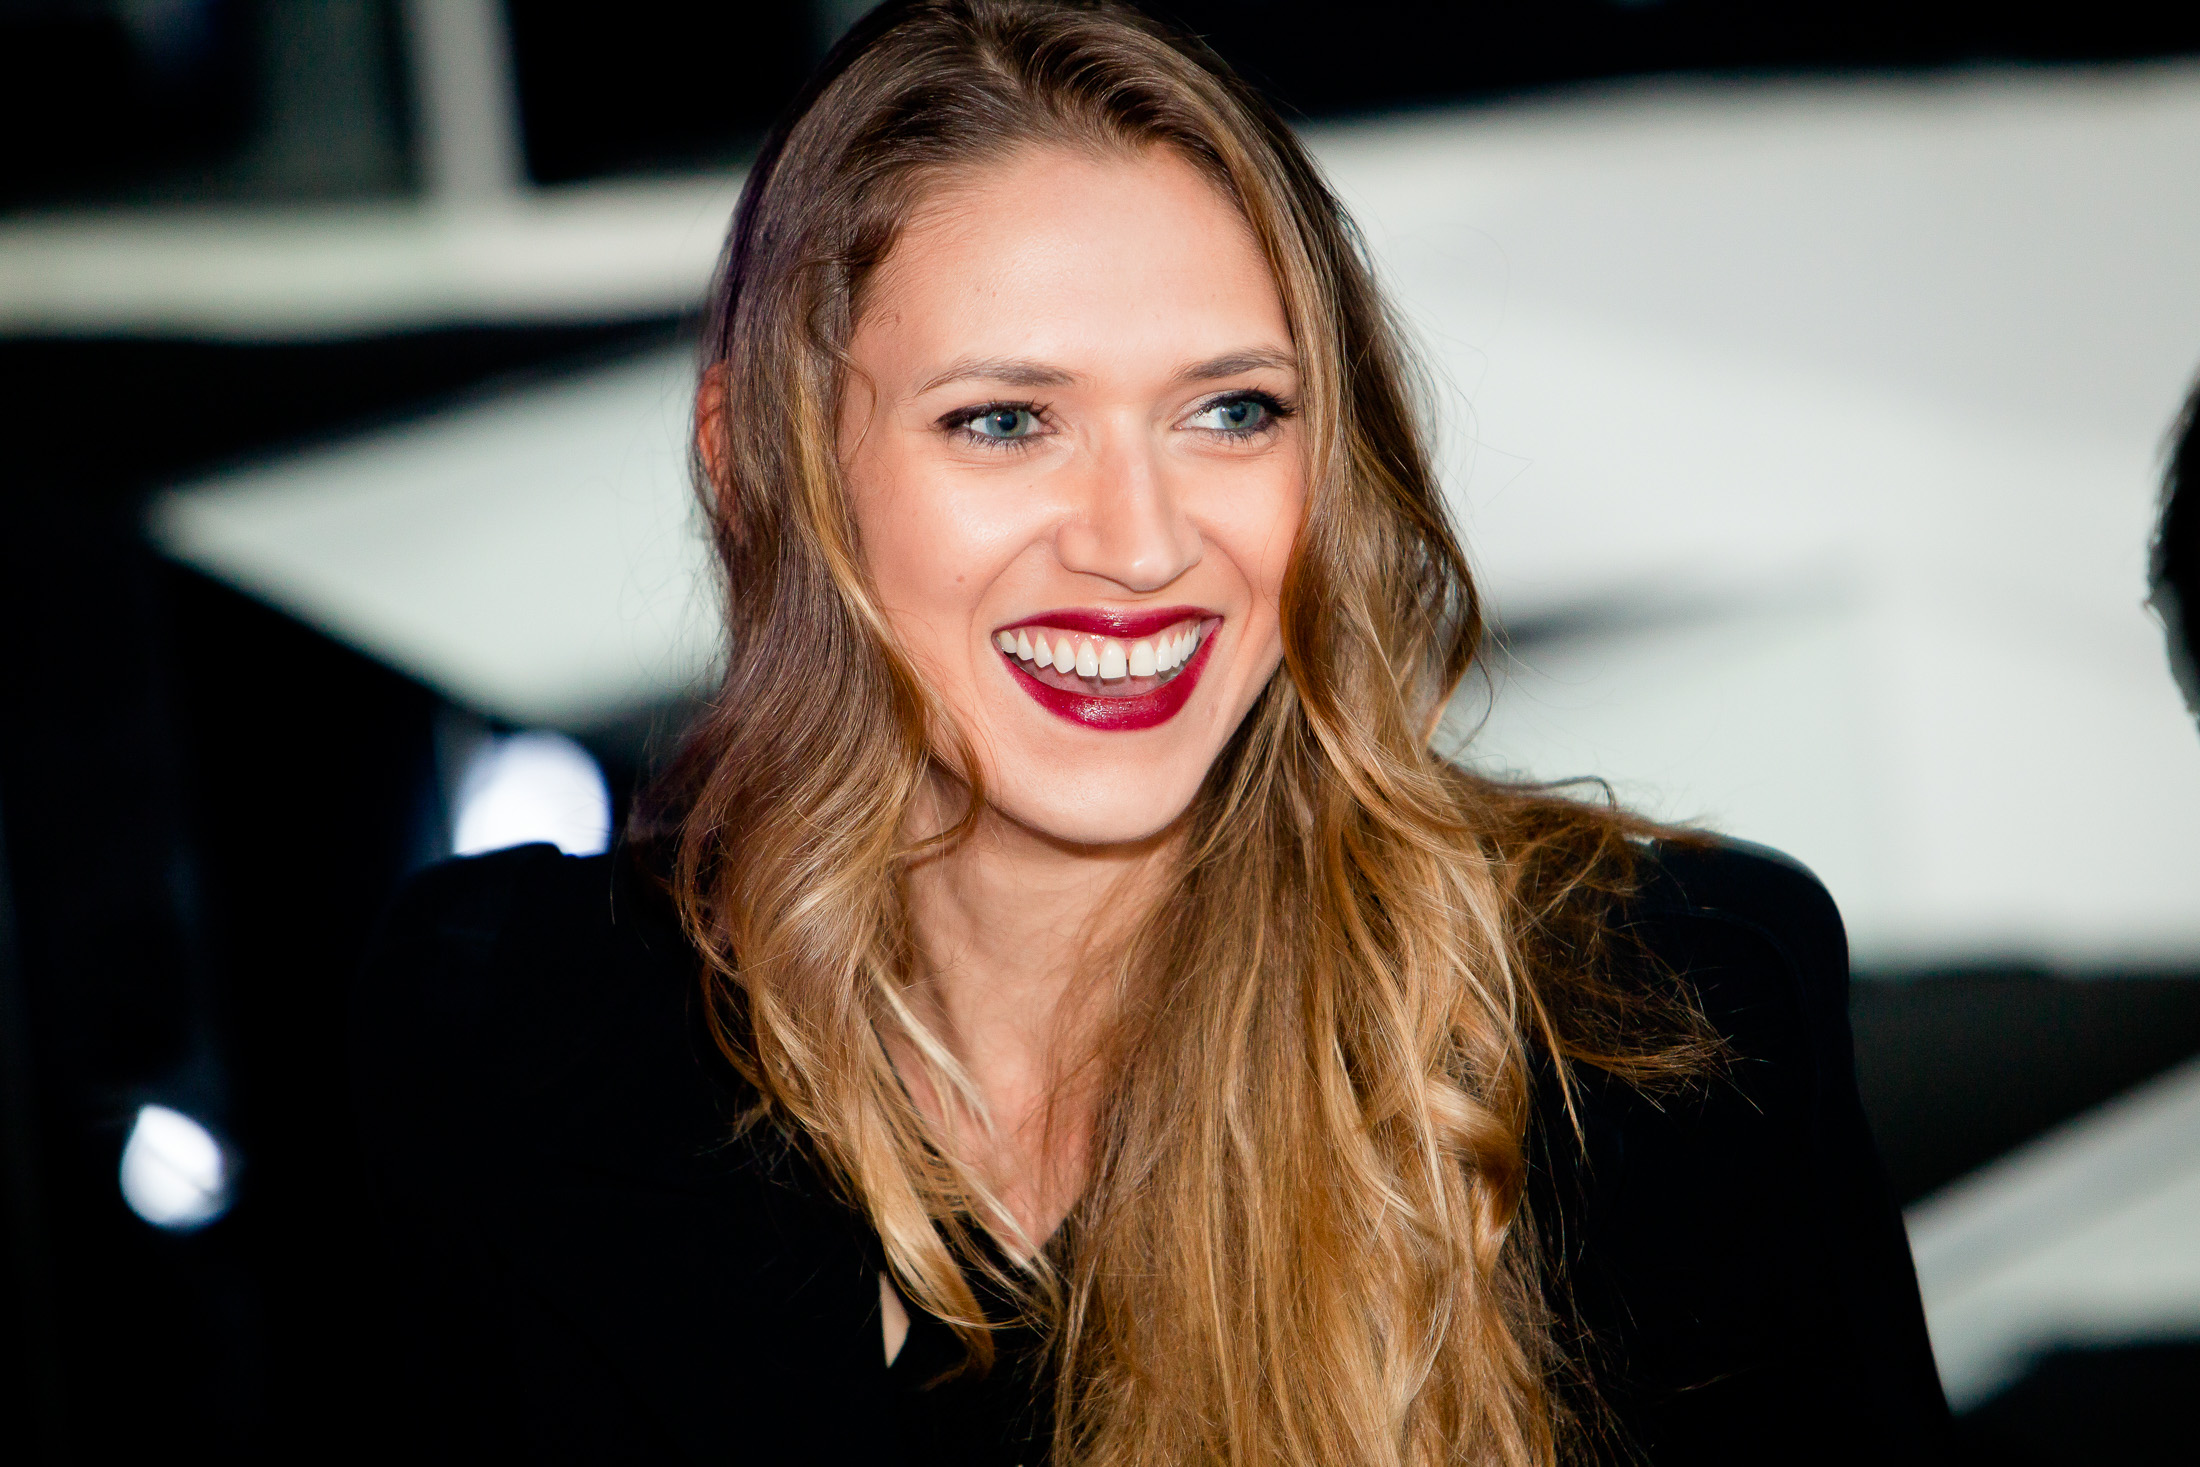 Rebecca-events-photographer-cannes-monaco24.jpg